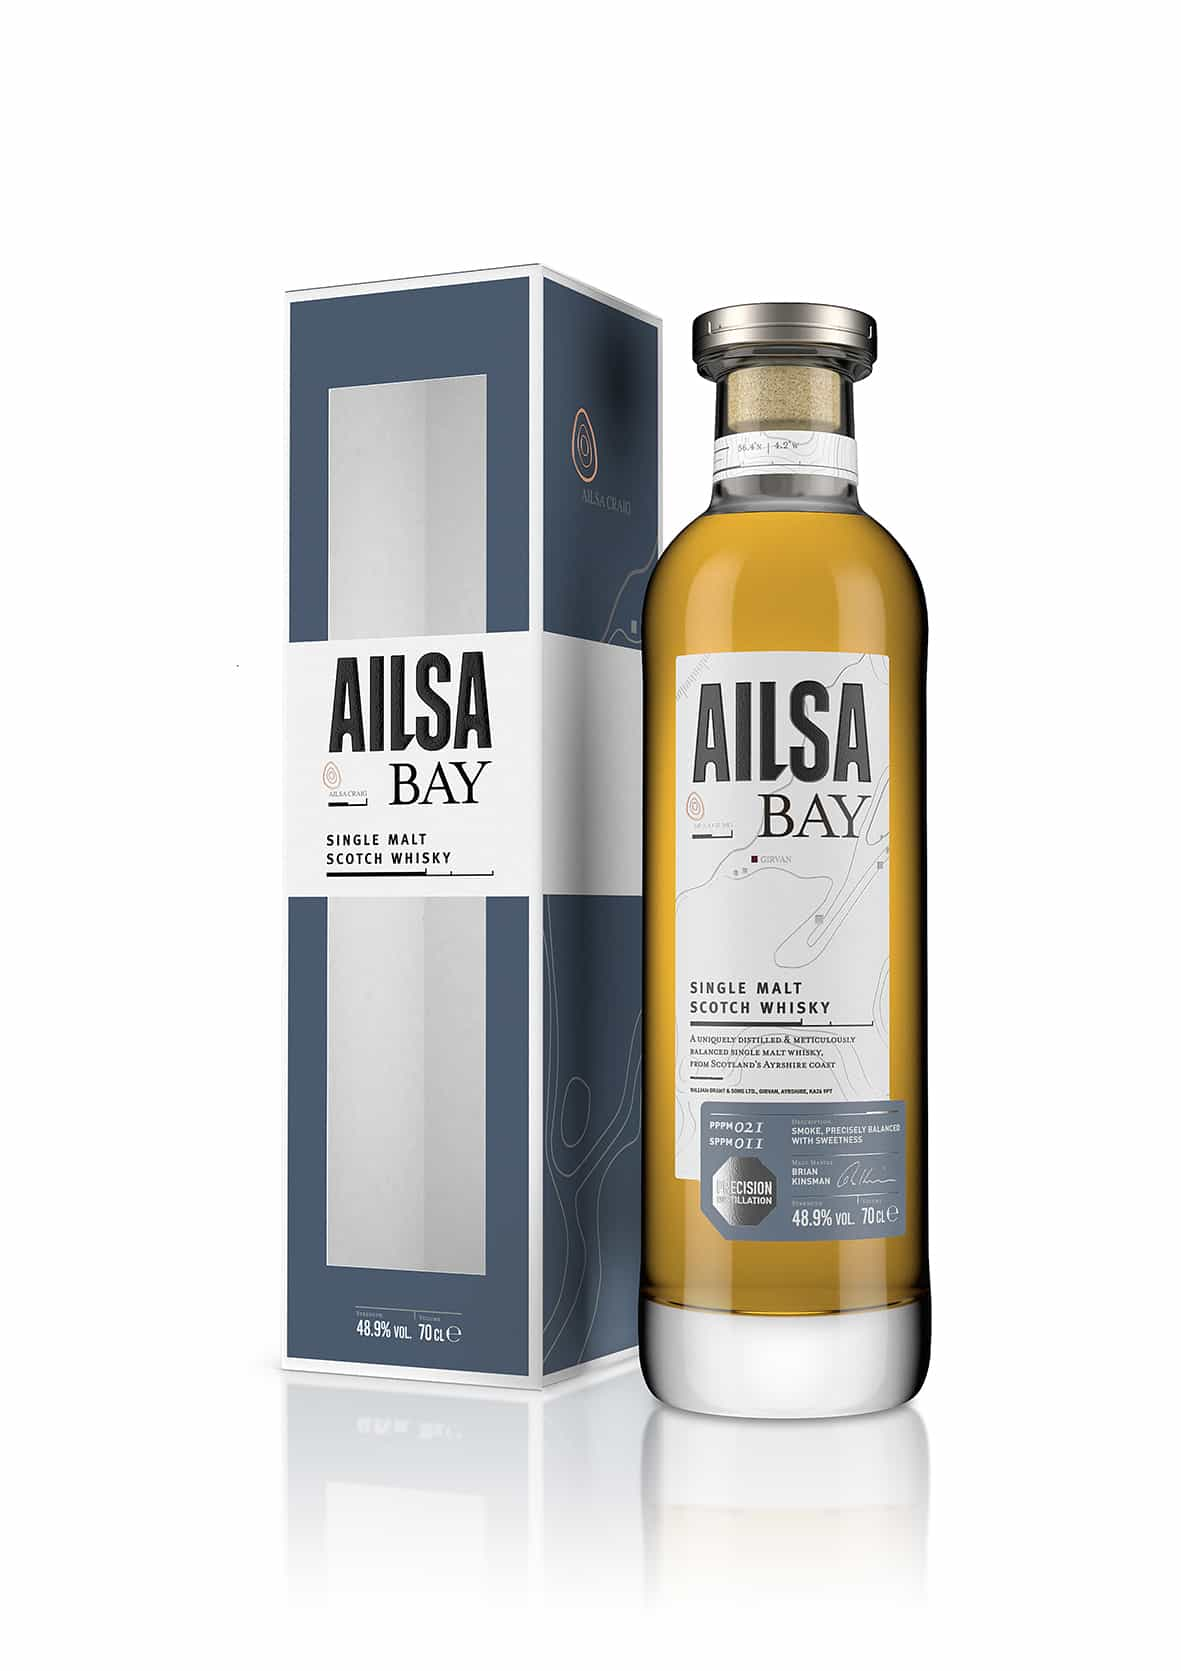 Ailsa Bay whisky